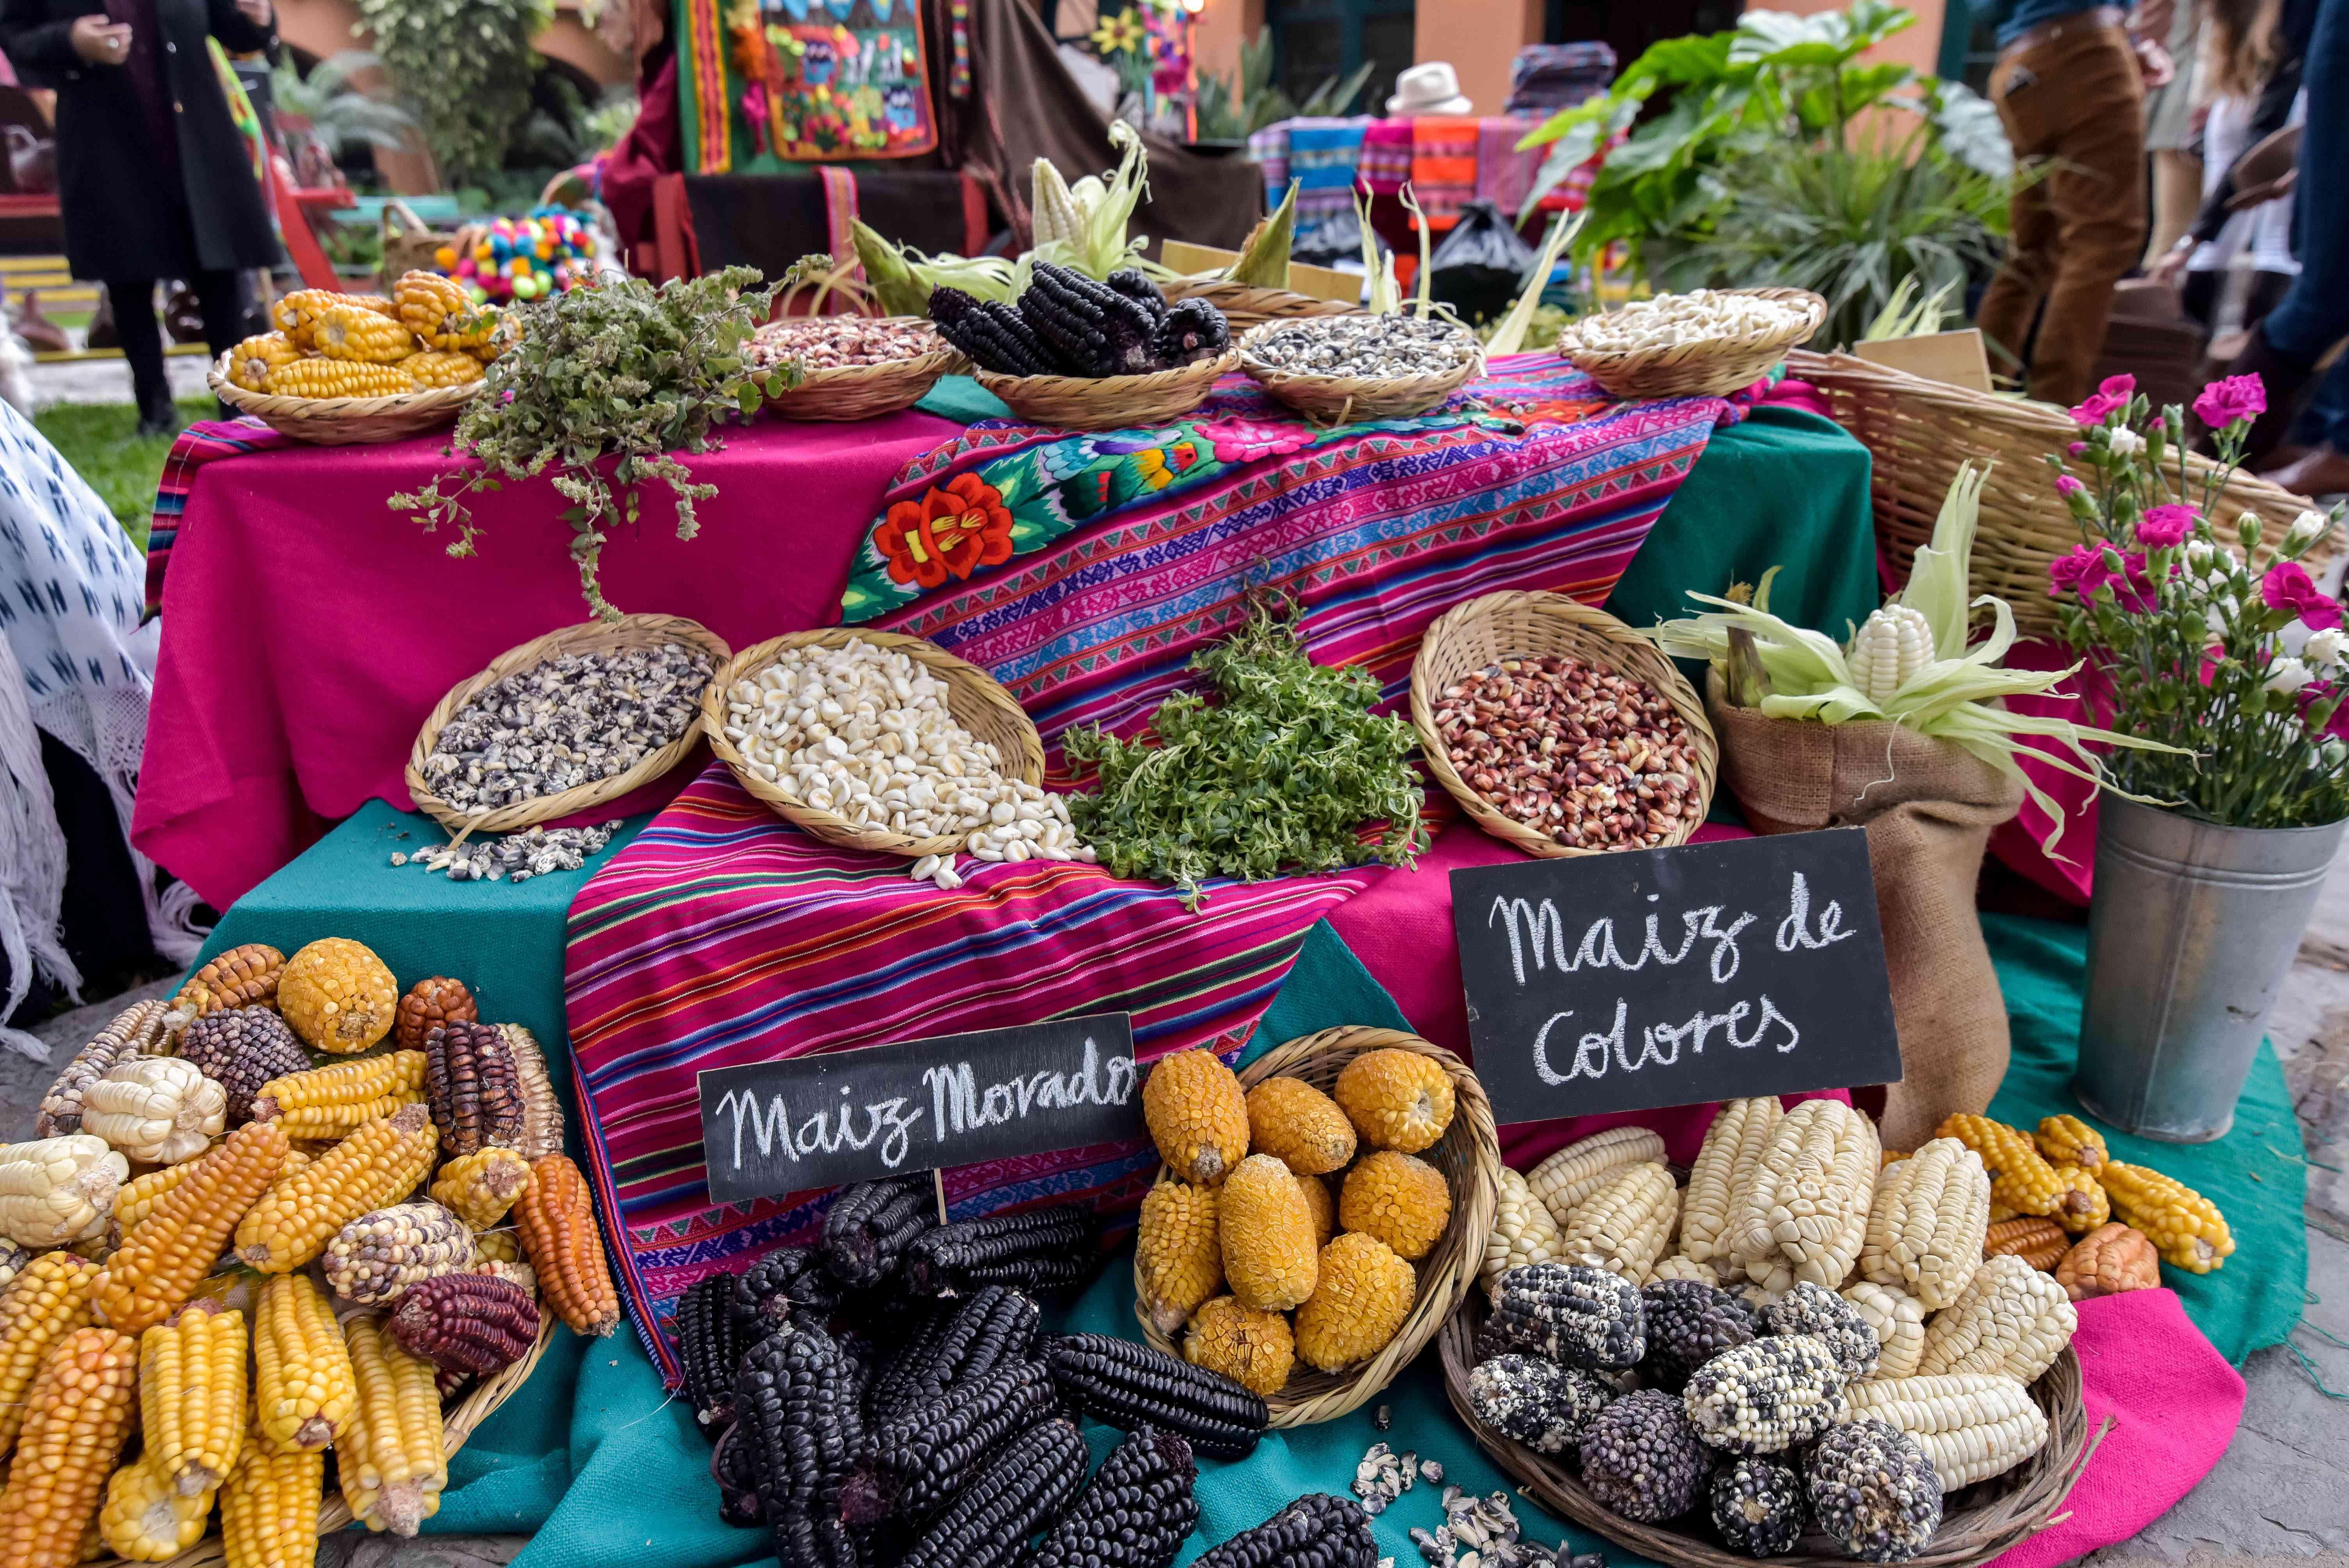 <p>Peruvian food display</p><br><br>